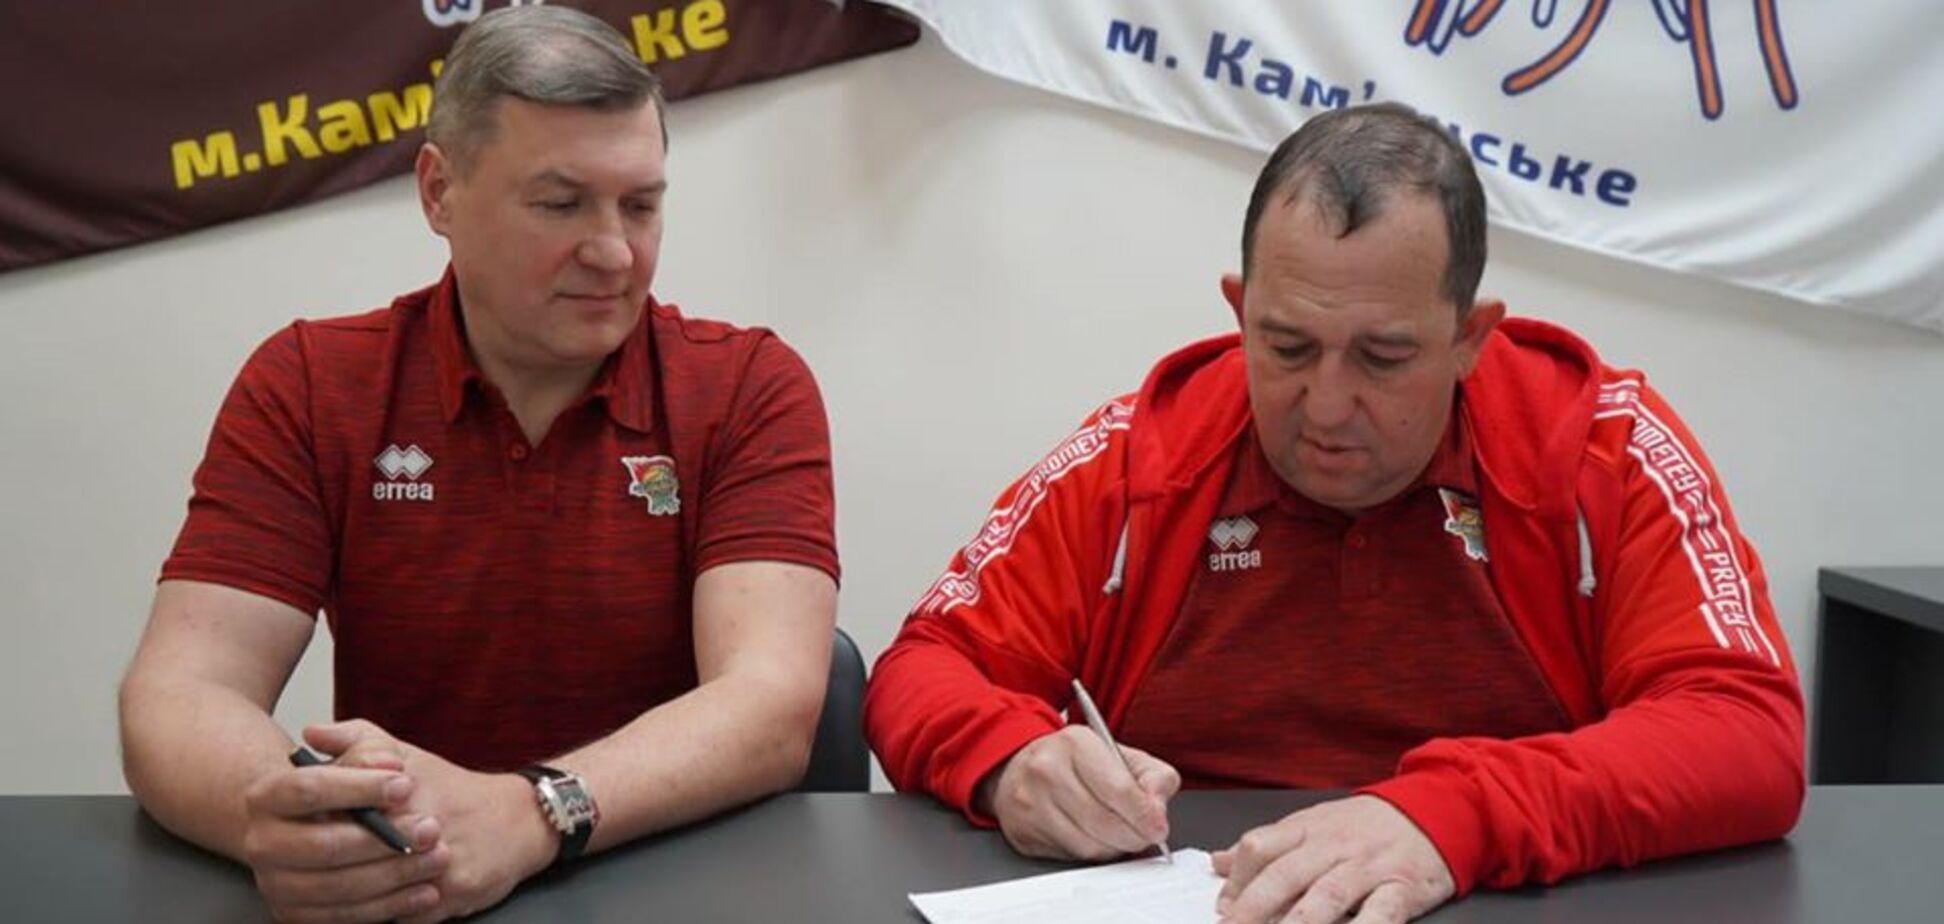 Президент СК 'Прометей' Володимир Дубінський представив нового тренера баскетбольного клубу